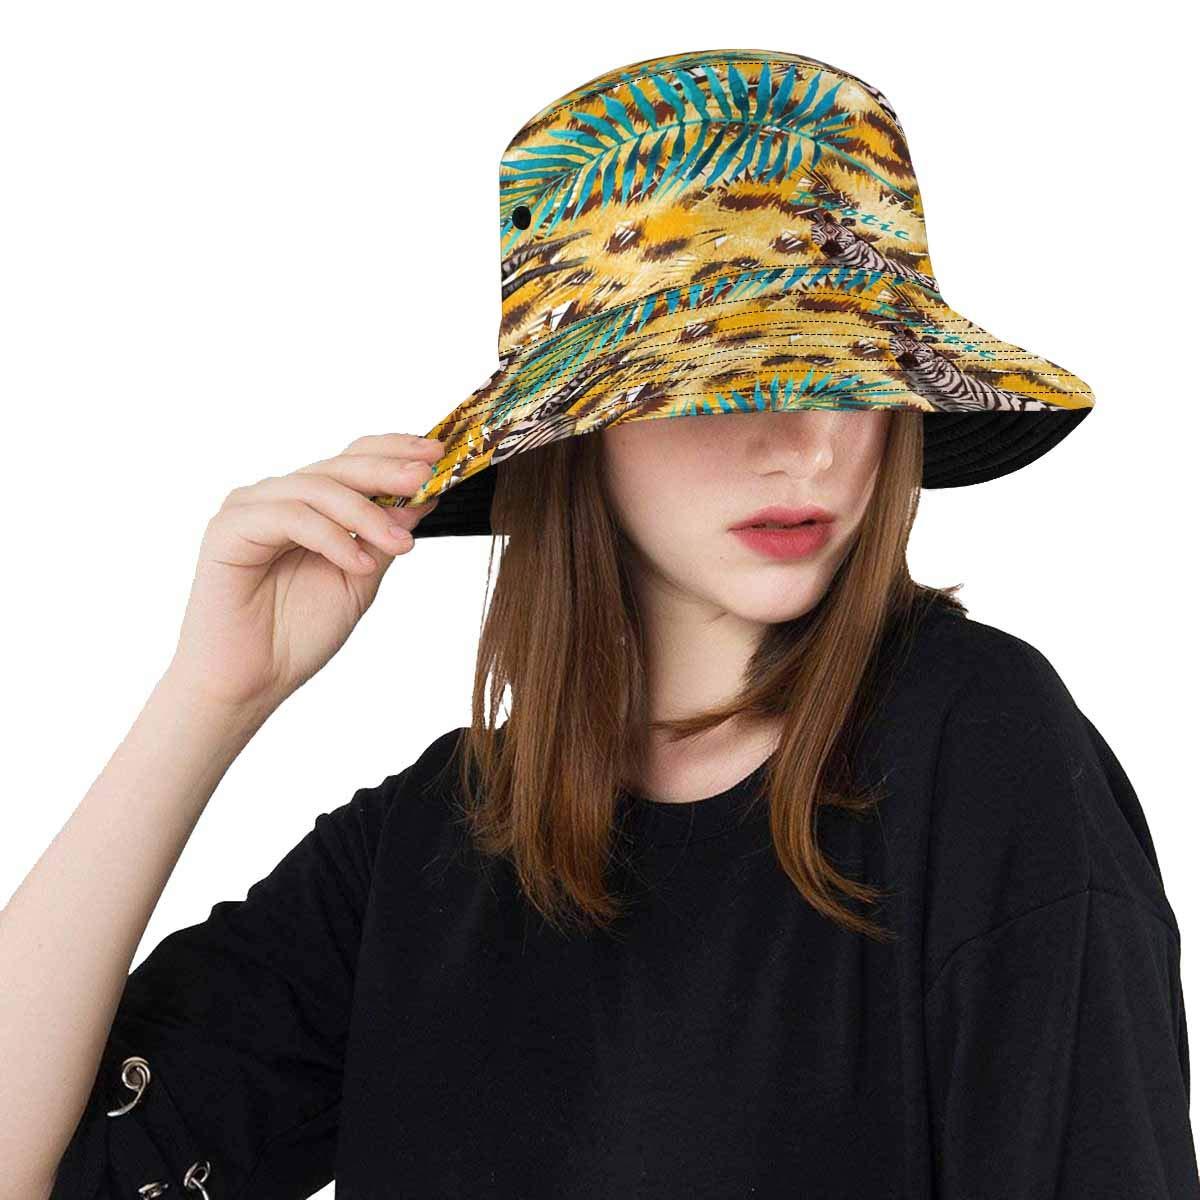 db8ece1fcc08 Amazon.com: INTERESTPRINT Leopard Skin Fishing Hat Travel Bucket Hat:  Clothing